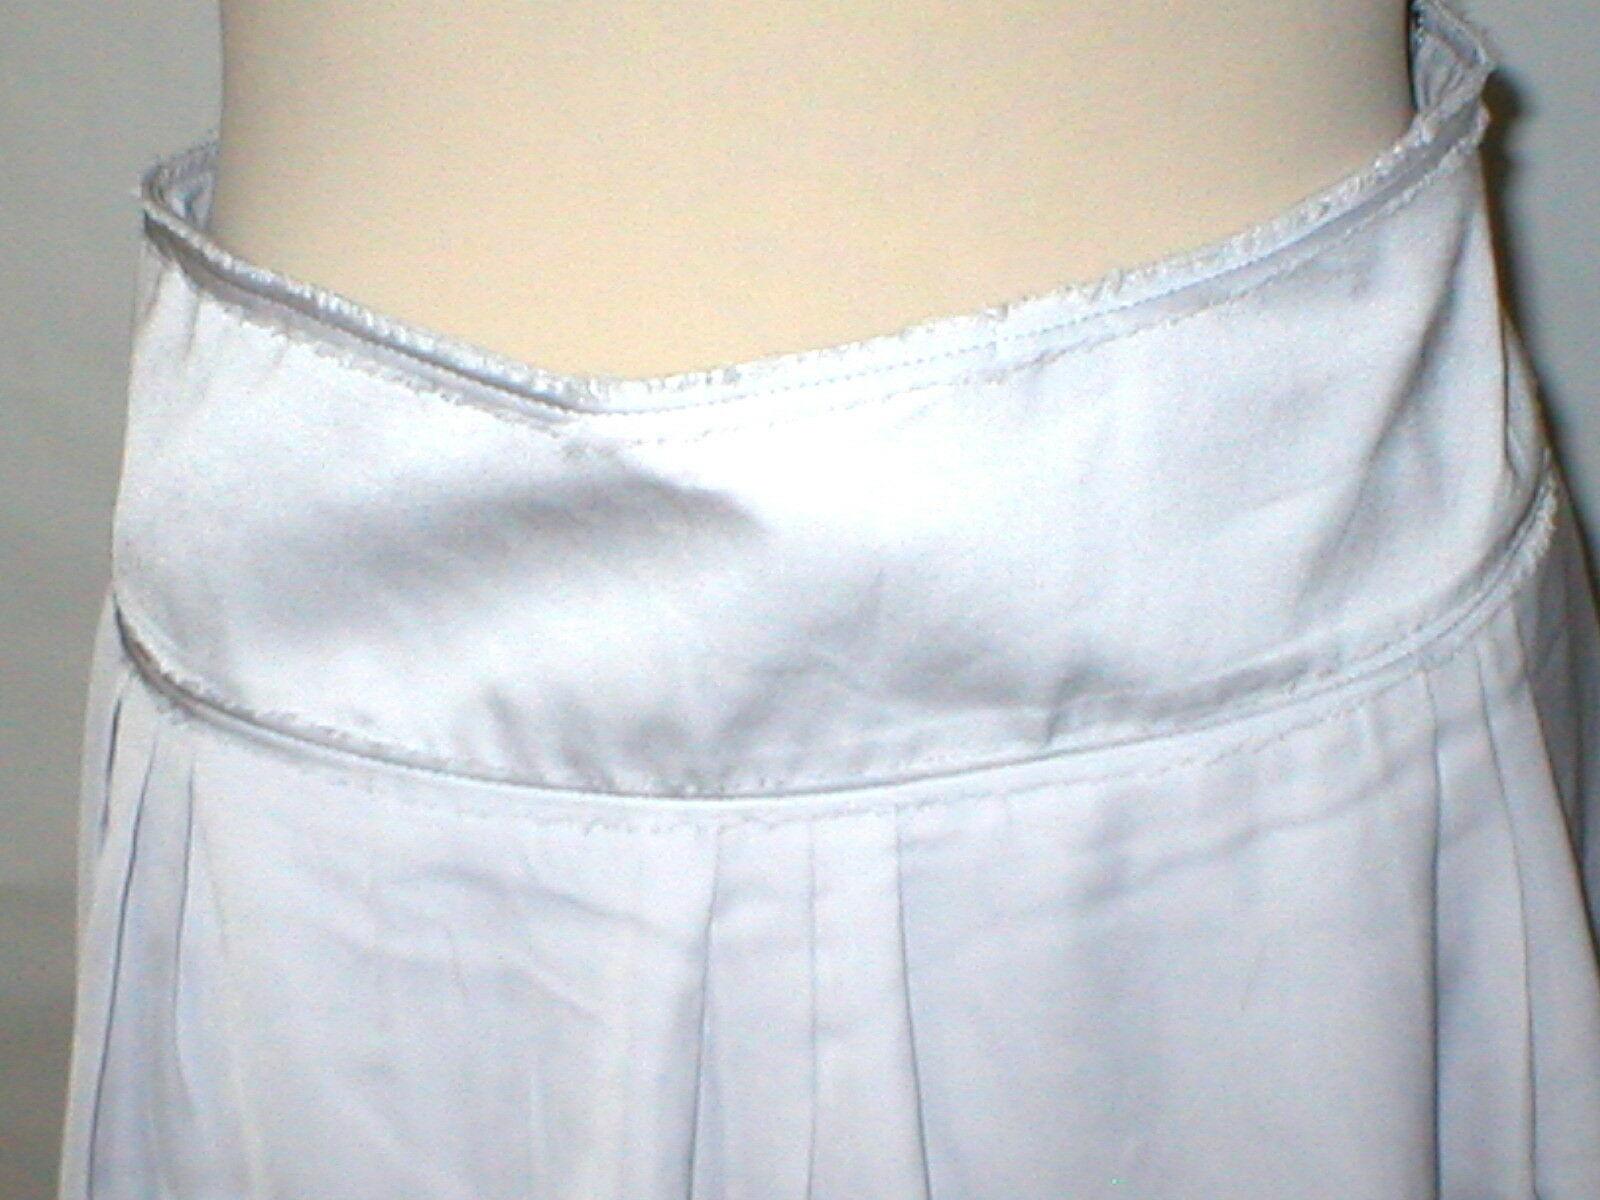 NEW Womens Gap Bubble $50 Skirt NWT 14 Mini Starlight Very light Grayish Purple image 8